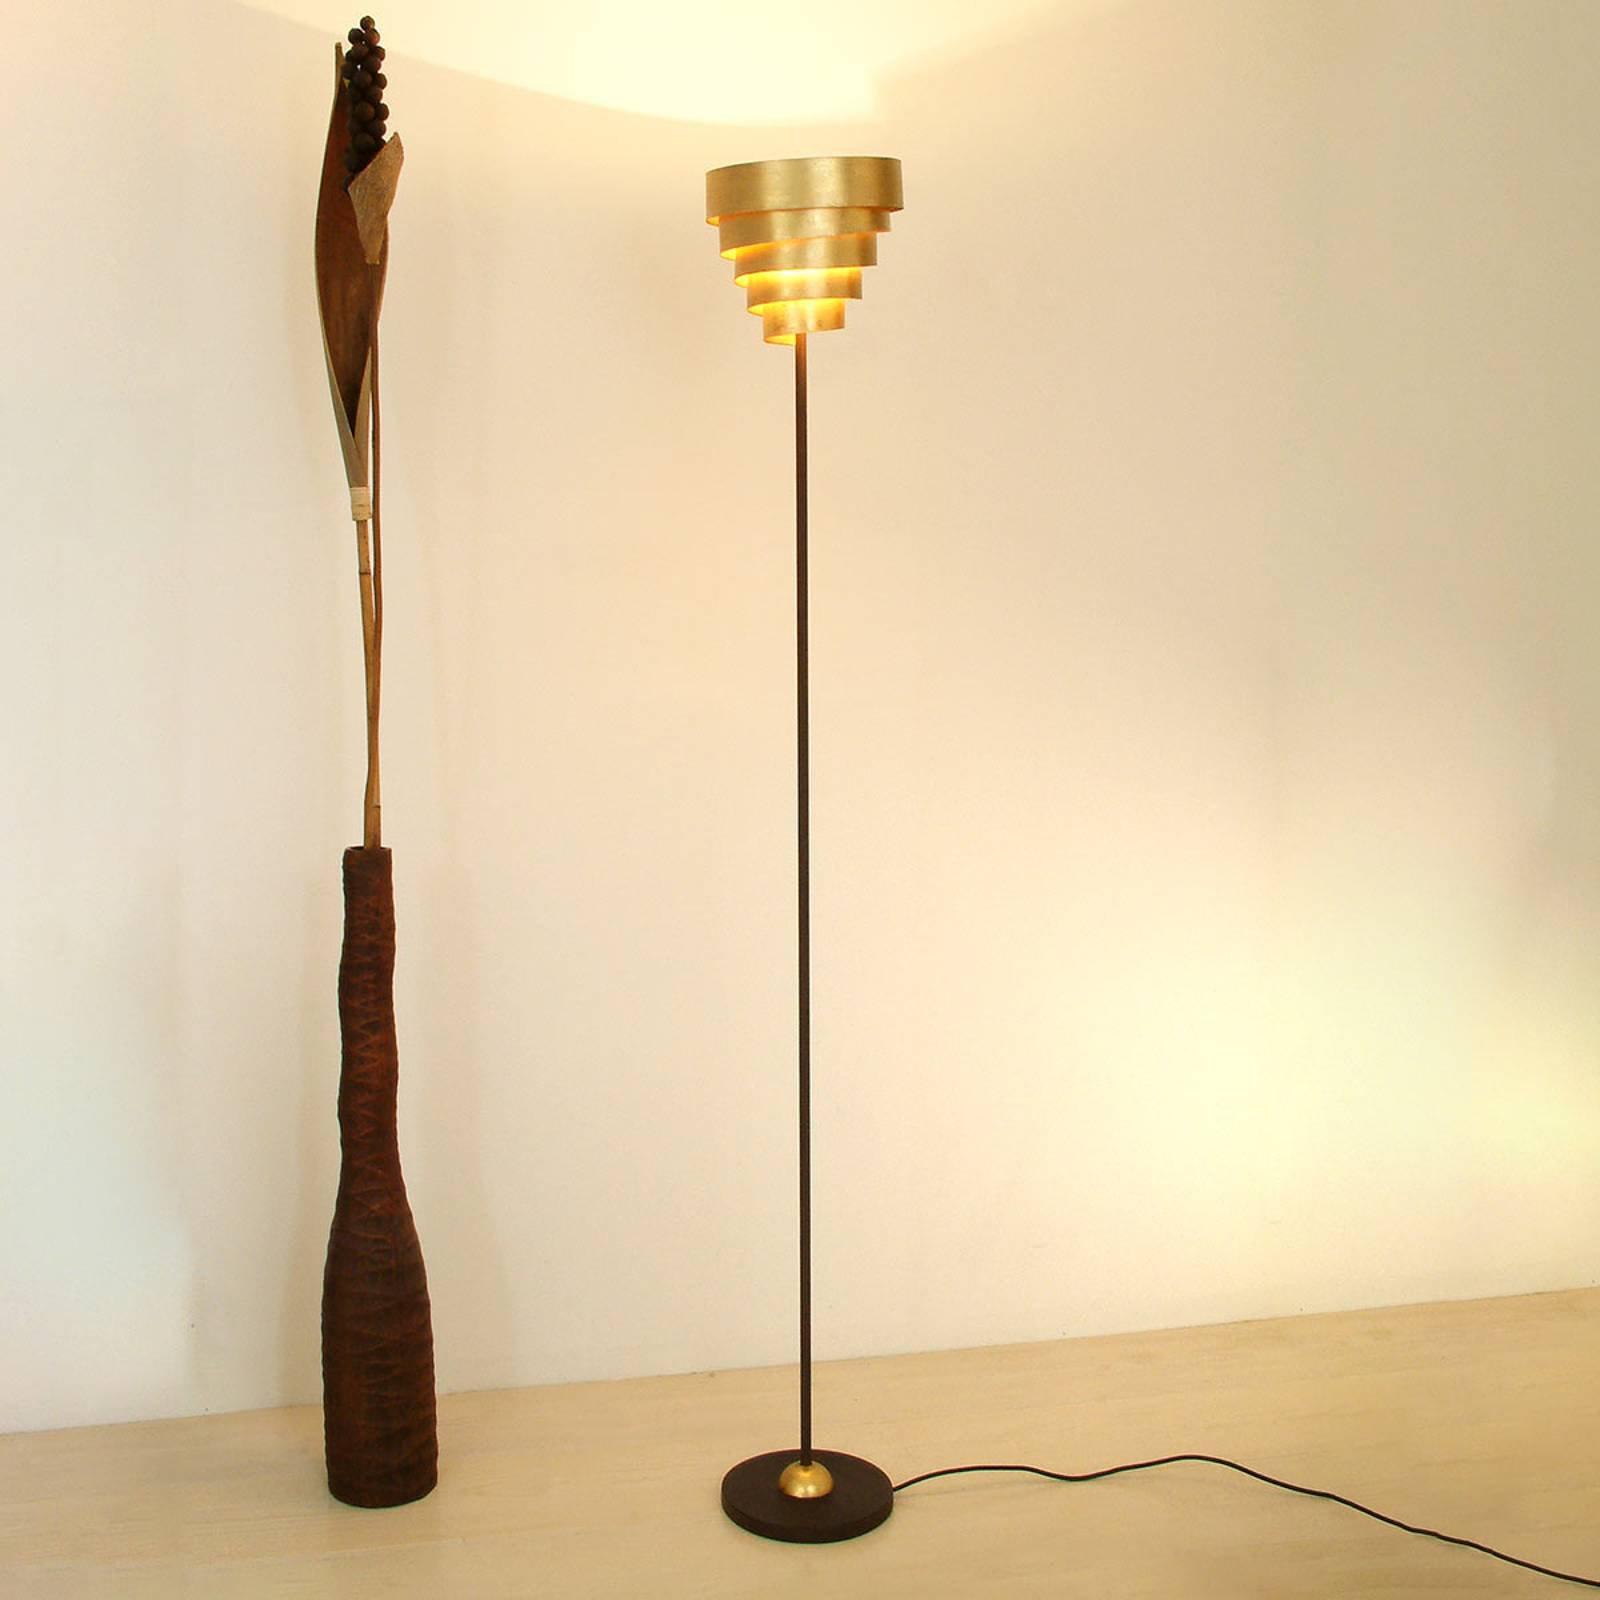 Glansfull BANDEROLE stålampe i brun gull